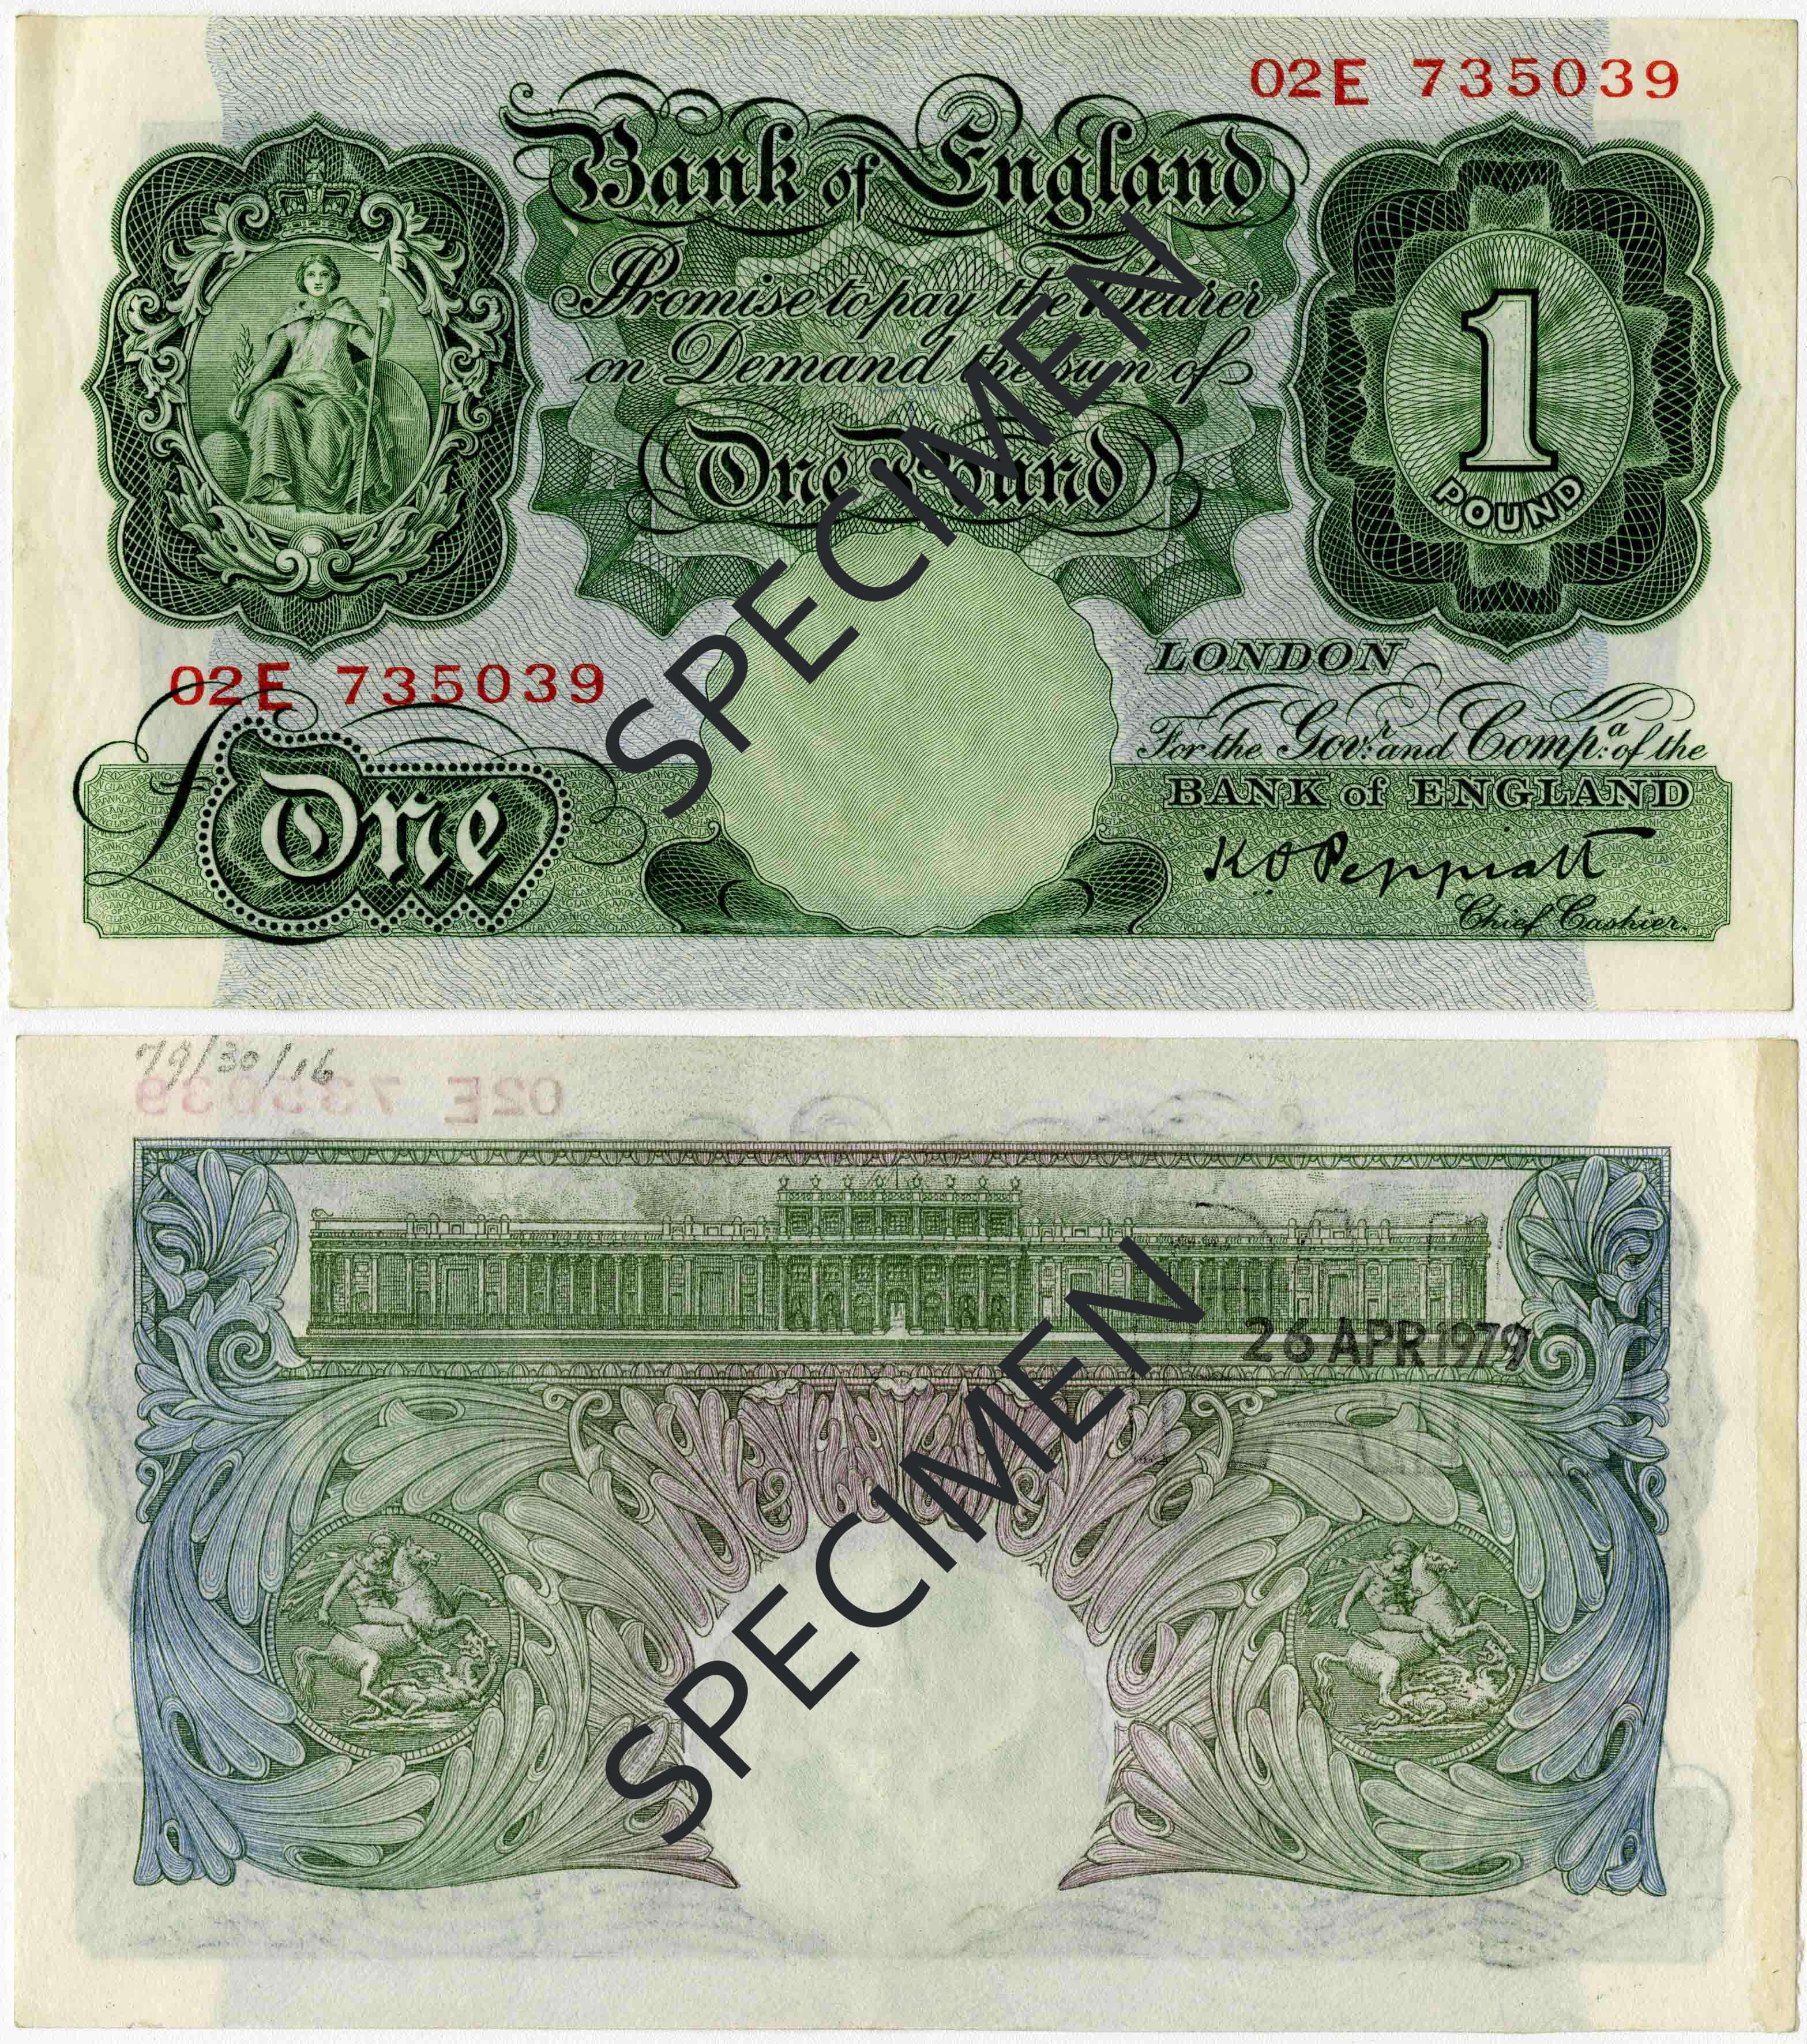 dating με τραπεζογραμμάτια Αγγλίας το νήμα γνωριμιών 90